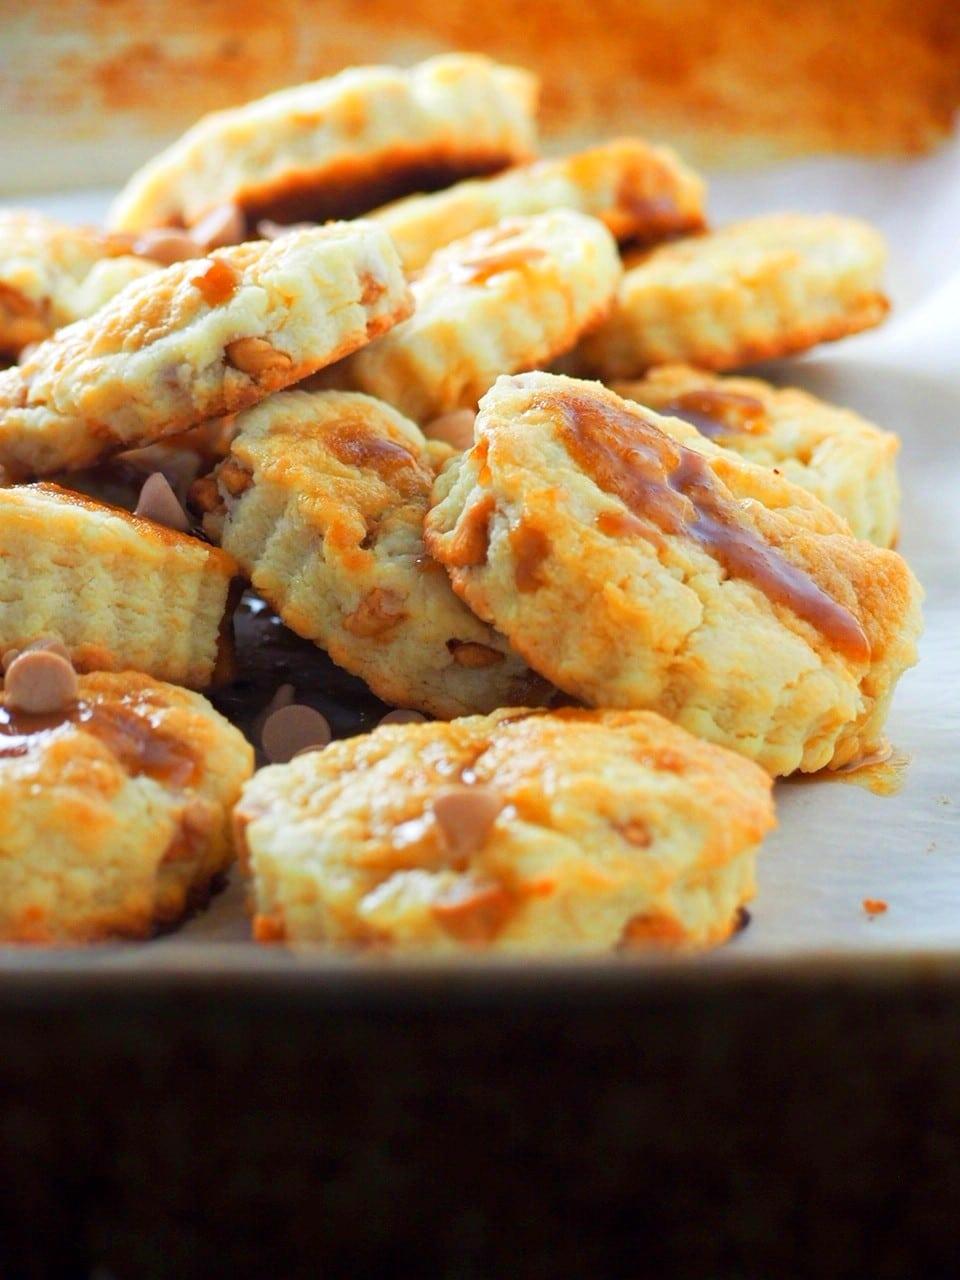 Closer shot of salted caramel scones on a baking pan.